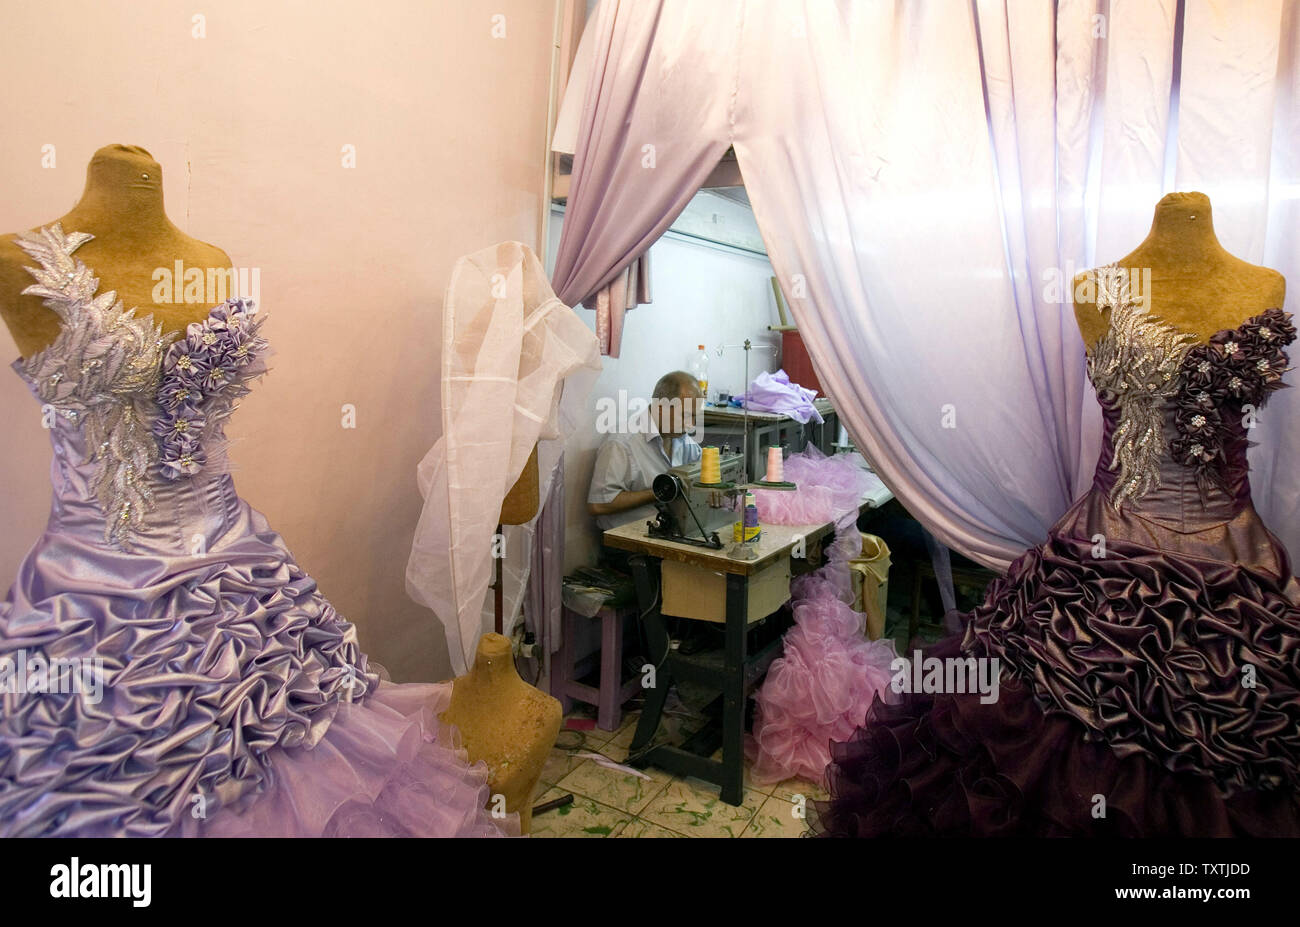 An Iranian Man Sews Wedding Dresses In A Shop In Downtown Tehran